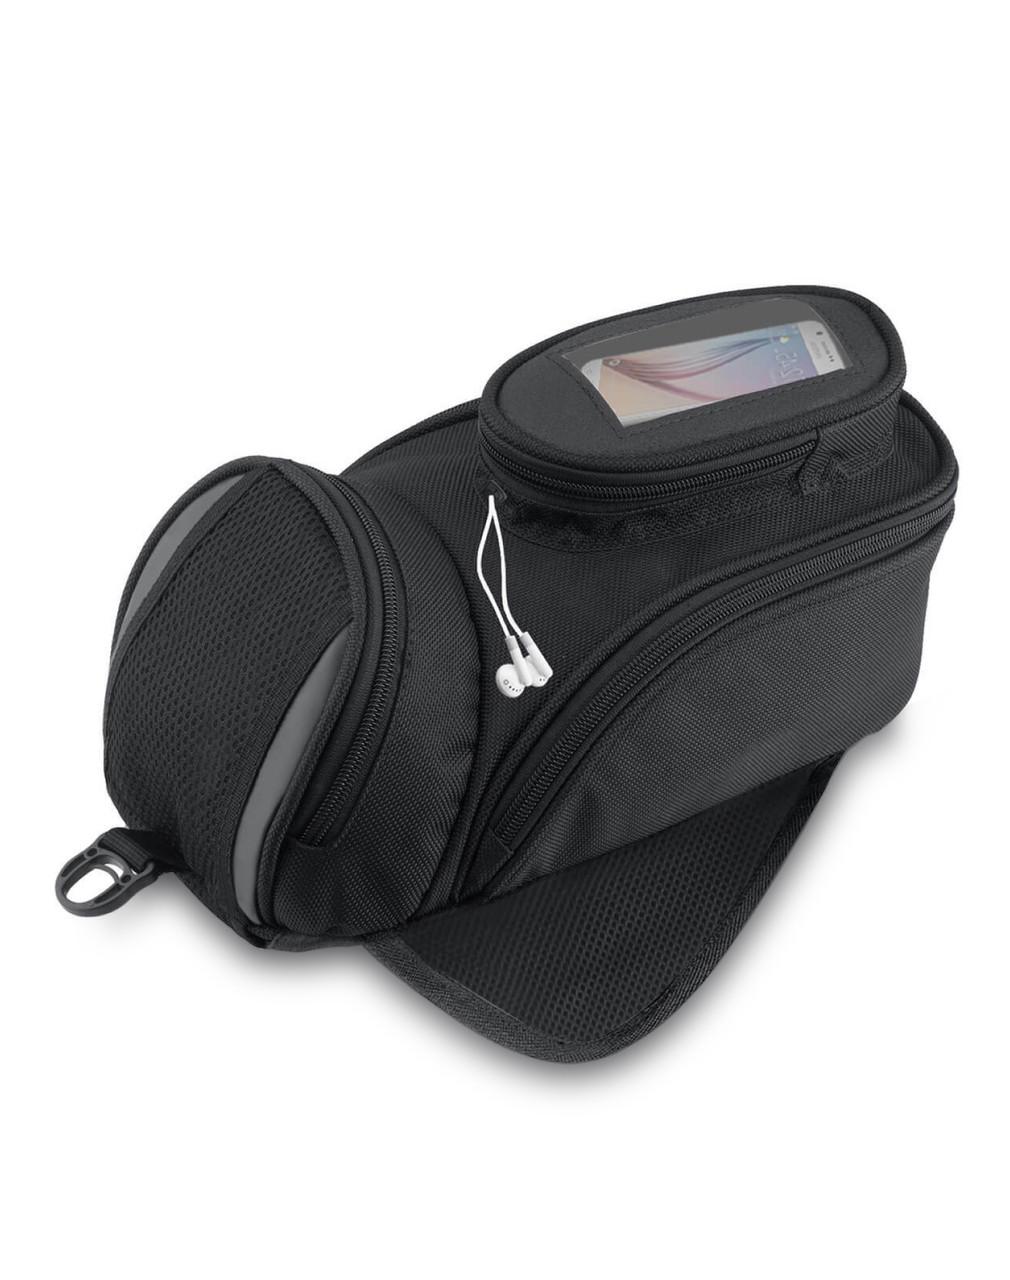 VikingBags Survival Series Suzuki Magnetic Motorcycle Tank Bag Main Bag View